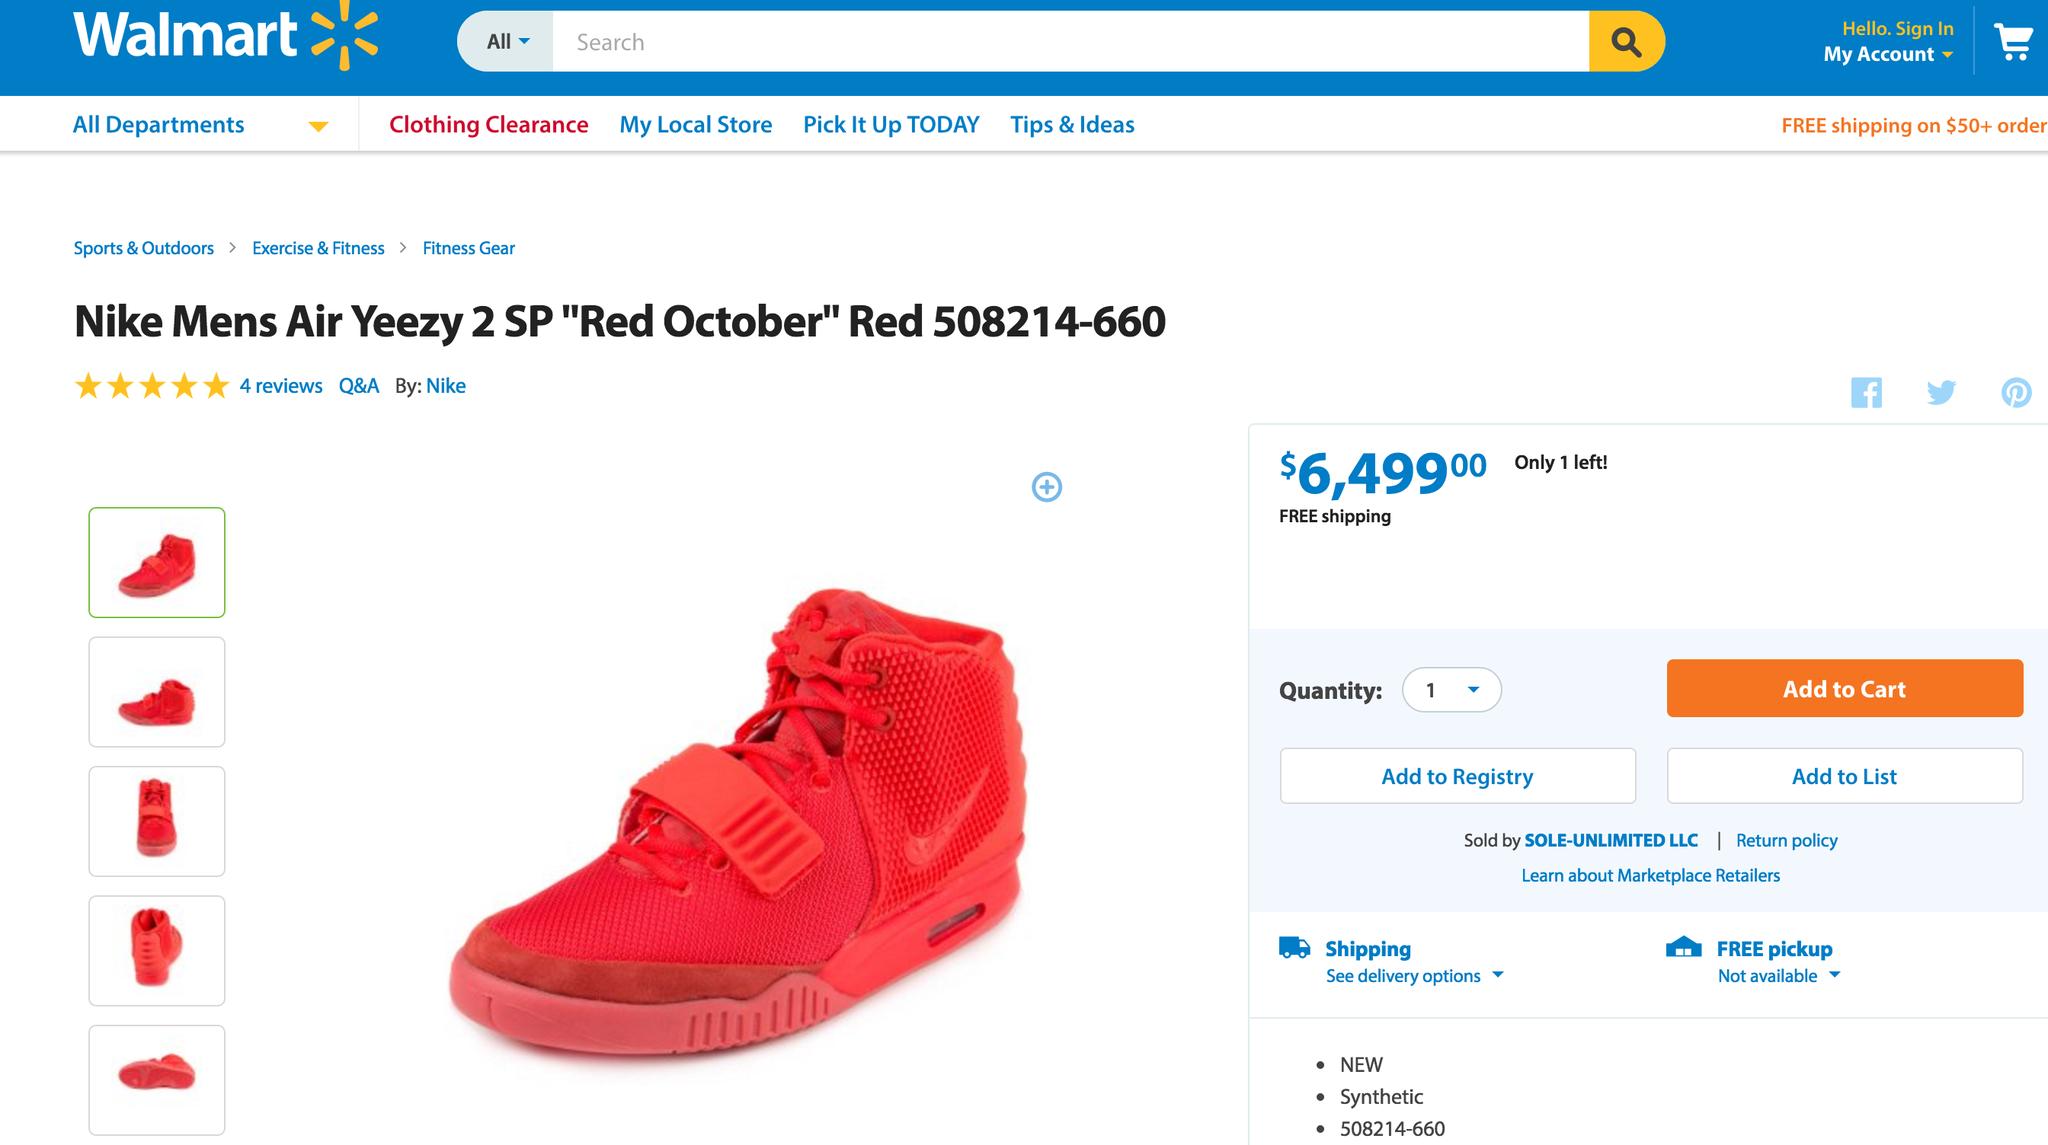 caja registradora Formular aficionado  Walmart website selling Kanye West's Nike Air Yeezy 2 sneakers for $6,499 -  al.com